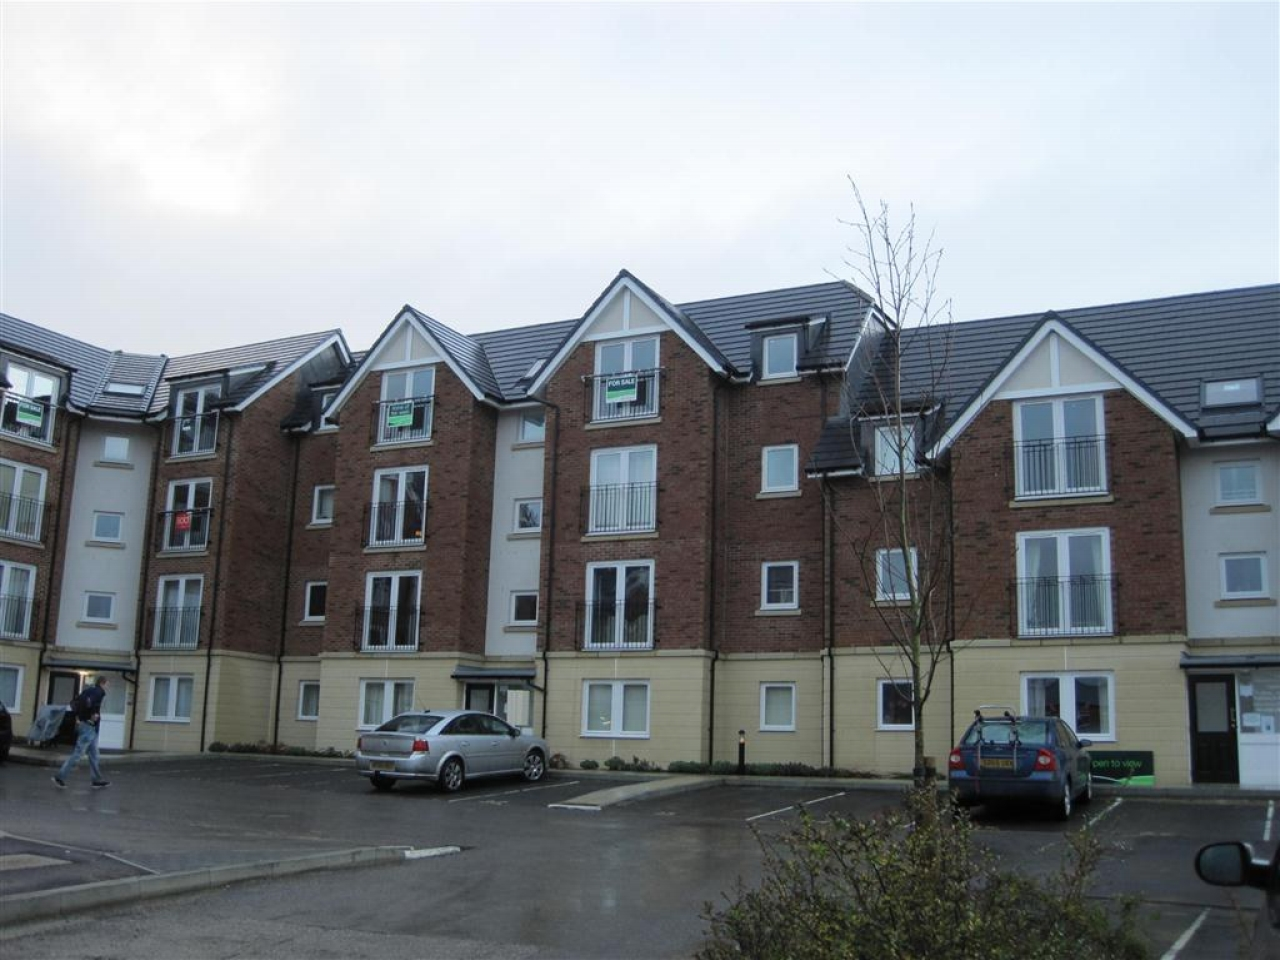 2 bedroom apartment flat/apartment Let in Durham - Photograph 1.